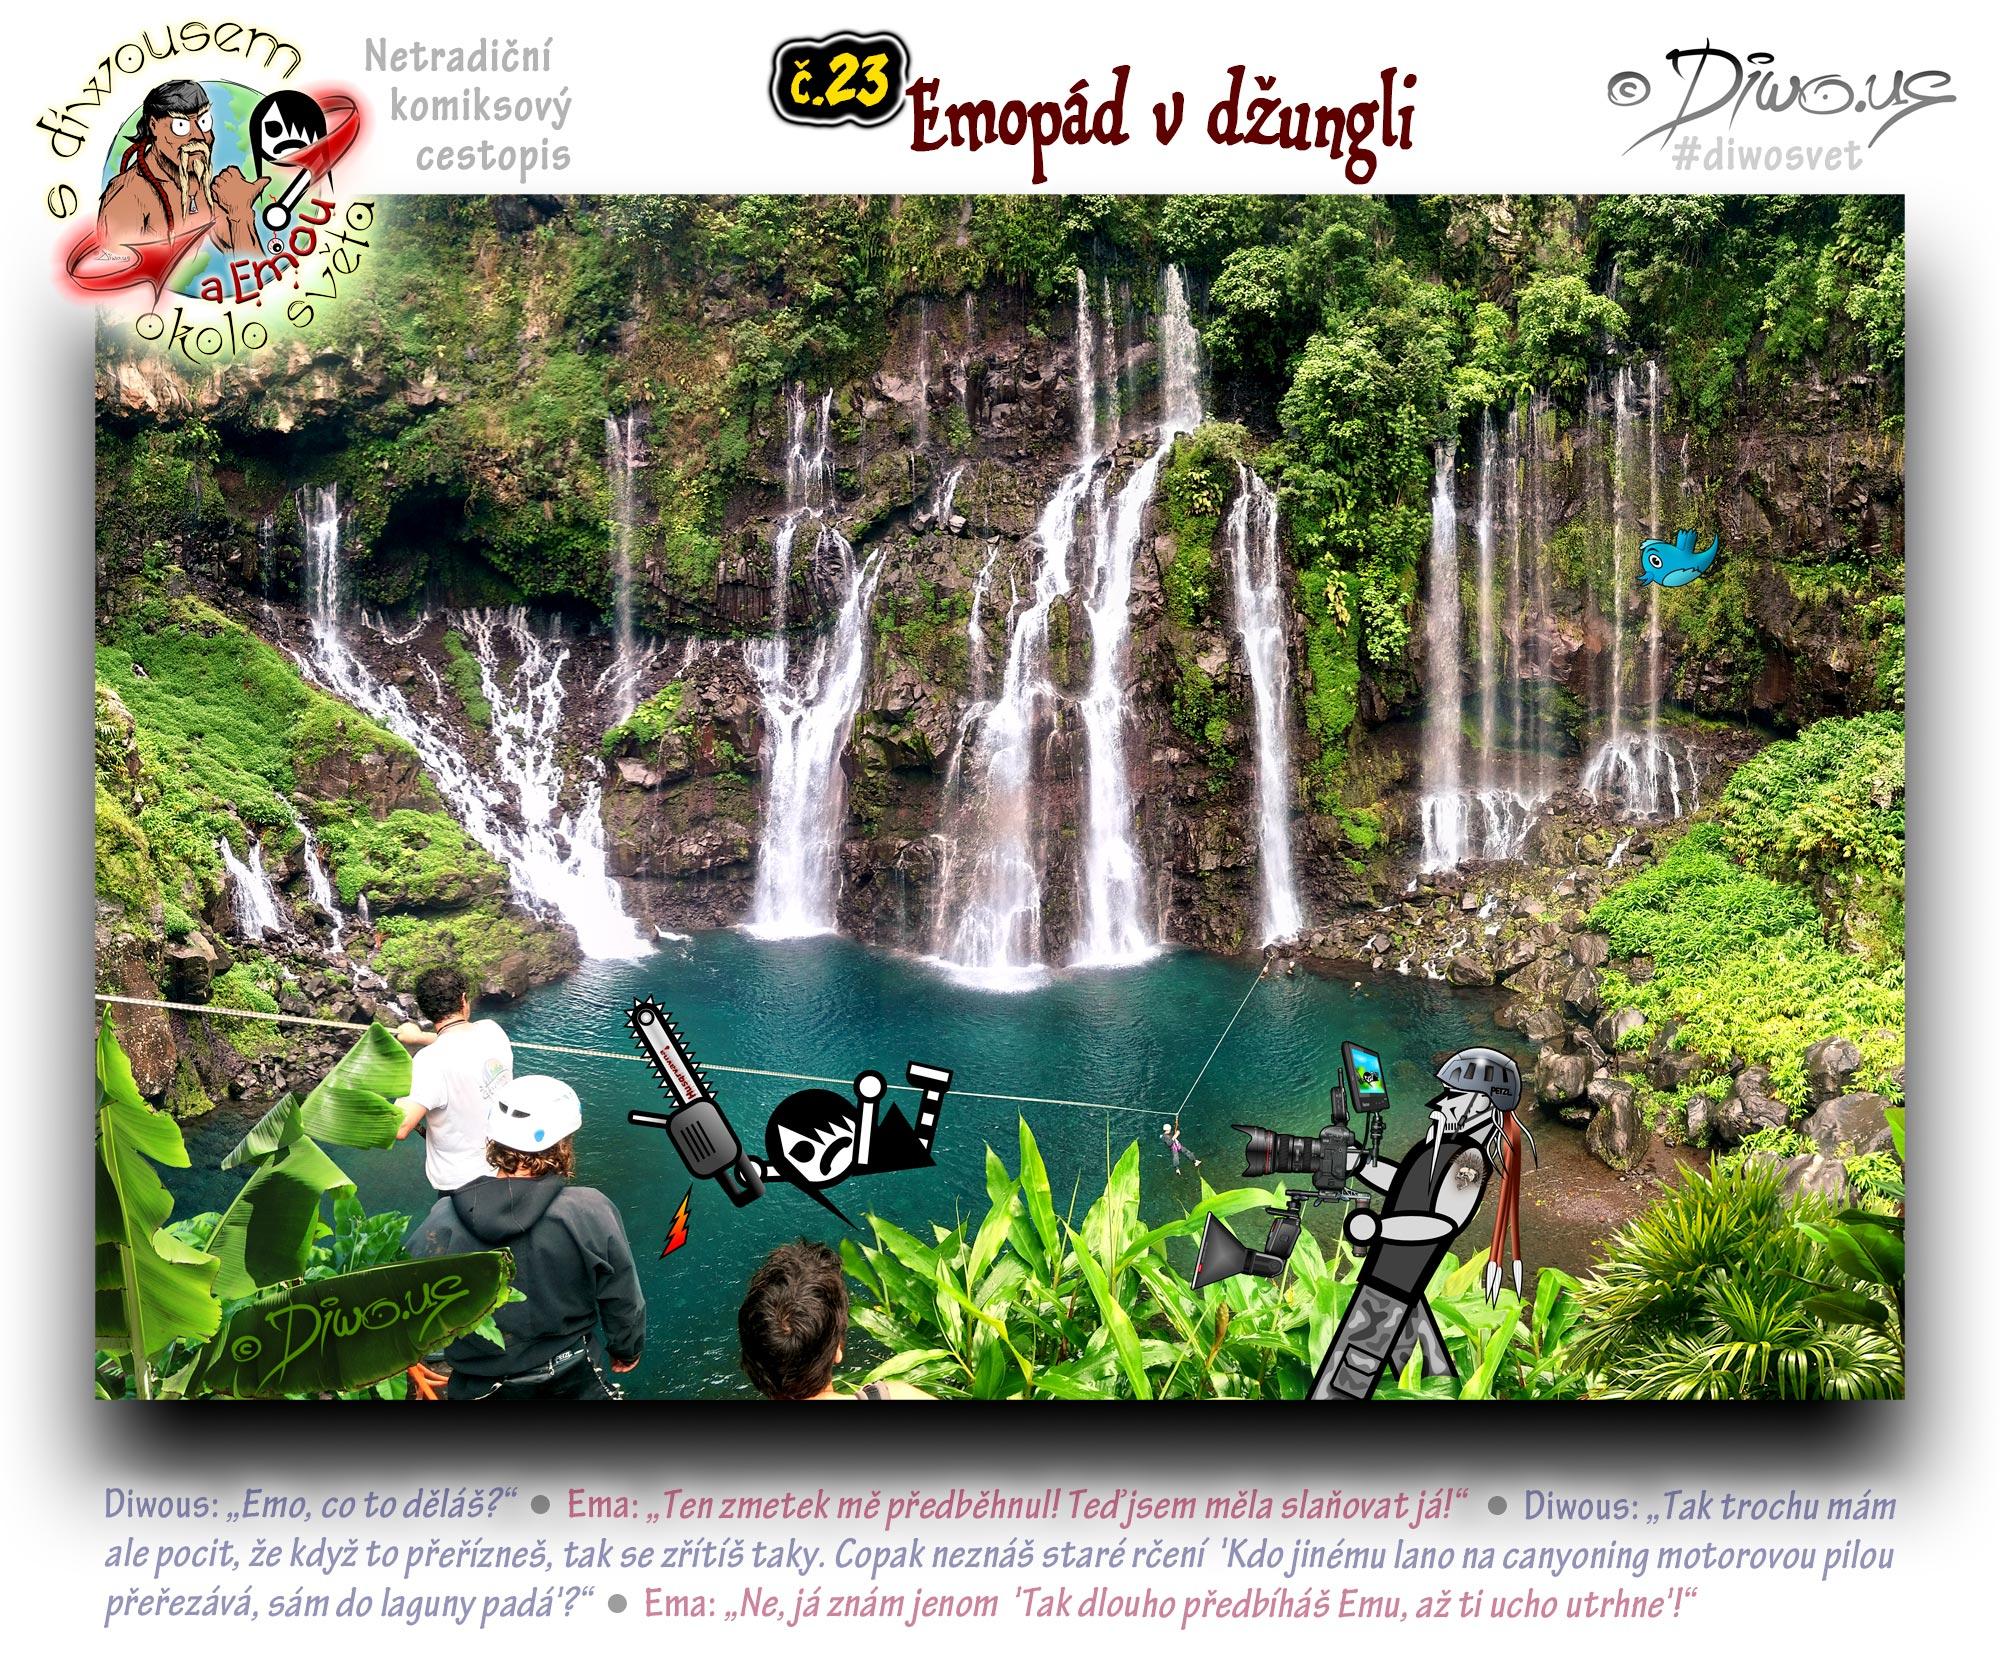 Diwous - netradiční komiksový cestopis, Ema, džungle, banánovník, vegetace, romantika, vodopád, laguna, jezero, canyoning, helma Petzl, lana, karabiny, vybavení, slaňování, cvrliky, Canon EOS 1D Mark IV, RIG master, Aputure Trigmaster Plus II 2.4G, Screen vs2, Speedlite 600EX II-RT, softbox diffuser, Canon Zoom Lens EF 16-35mm 1:2.8 L II USM, jungle, banana tree, waterfall, lagoon, lake, helmet, rope down, snap hook